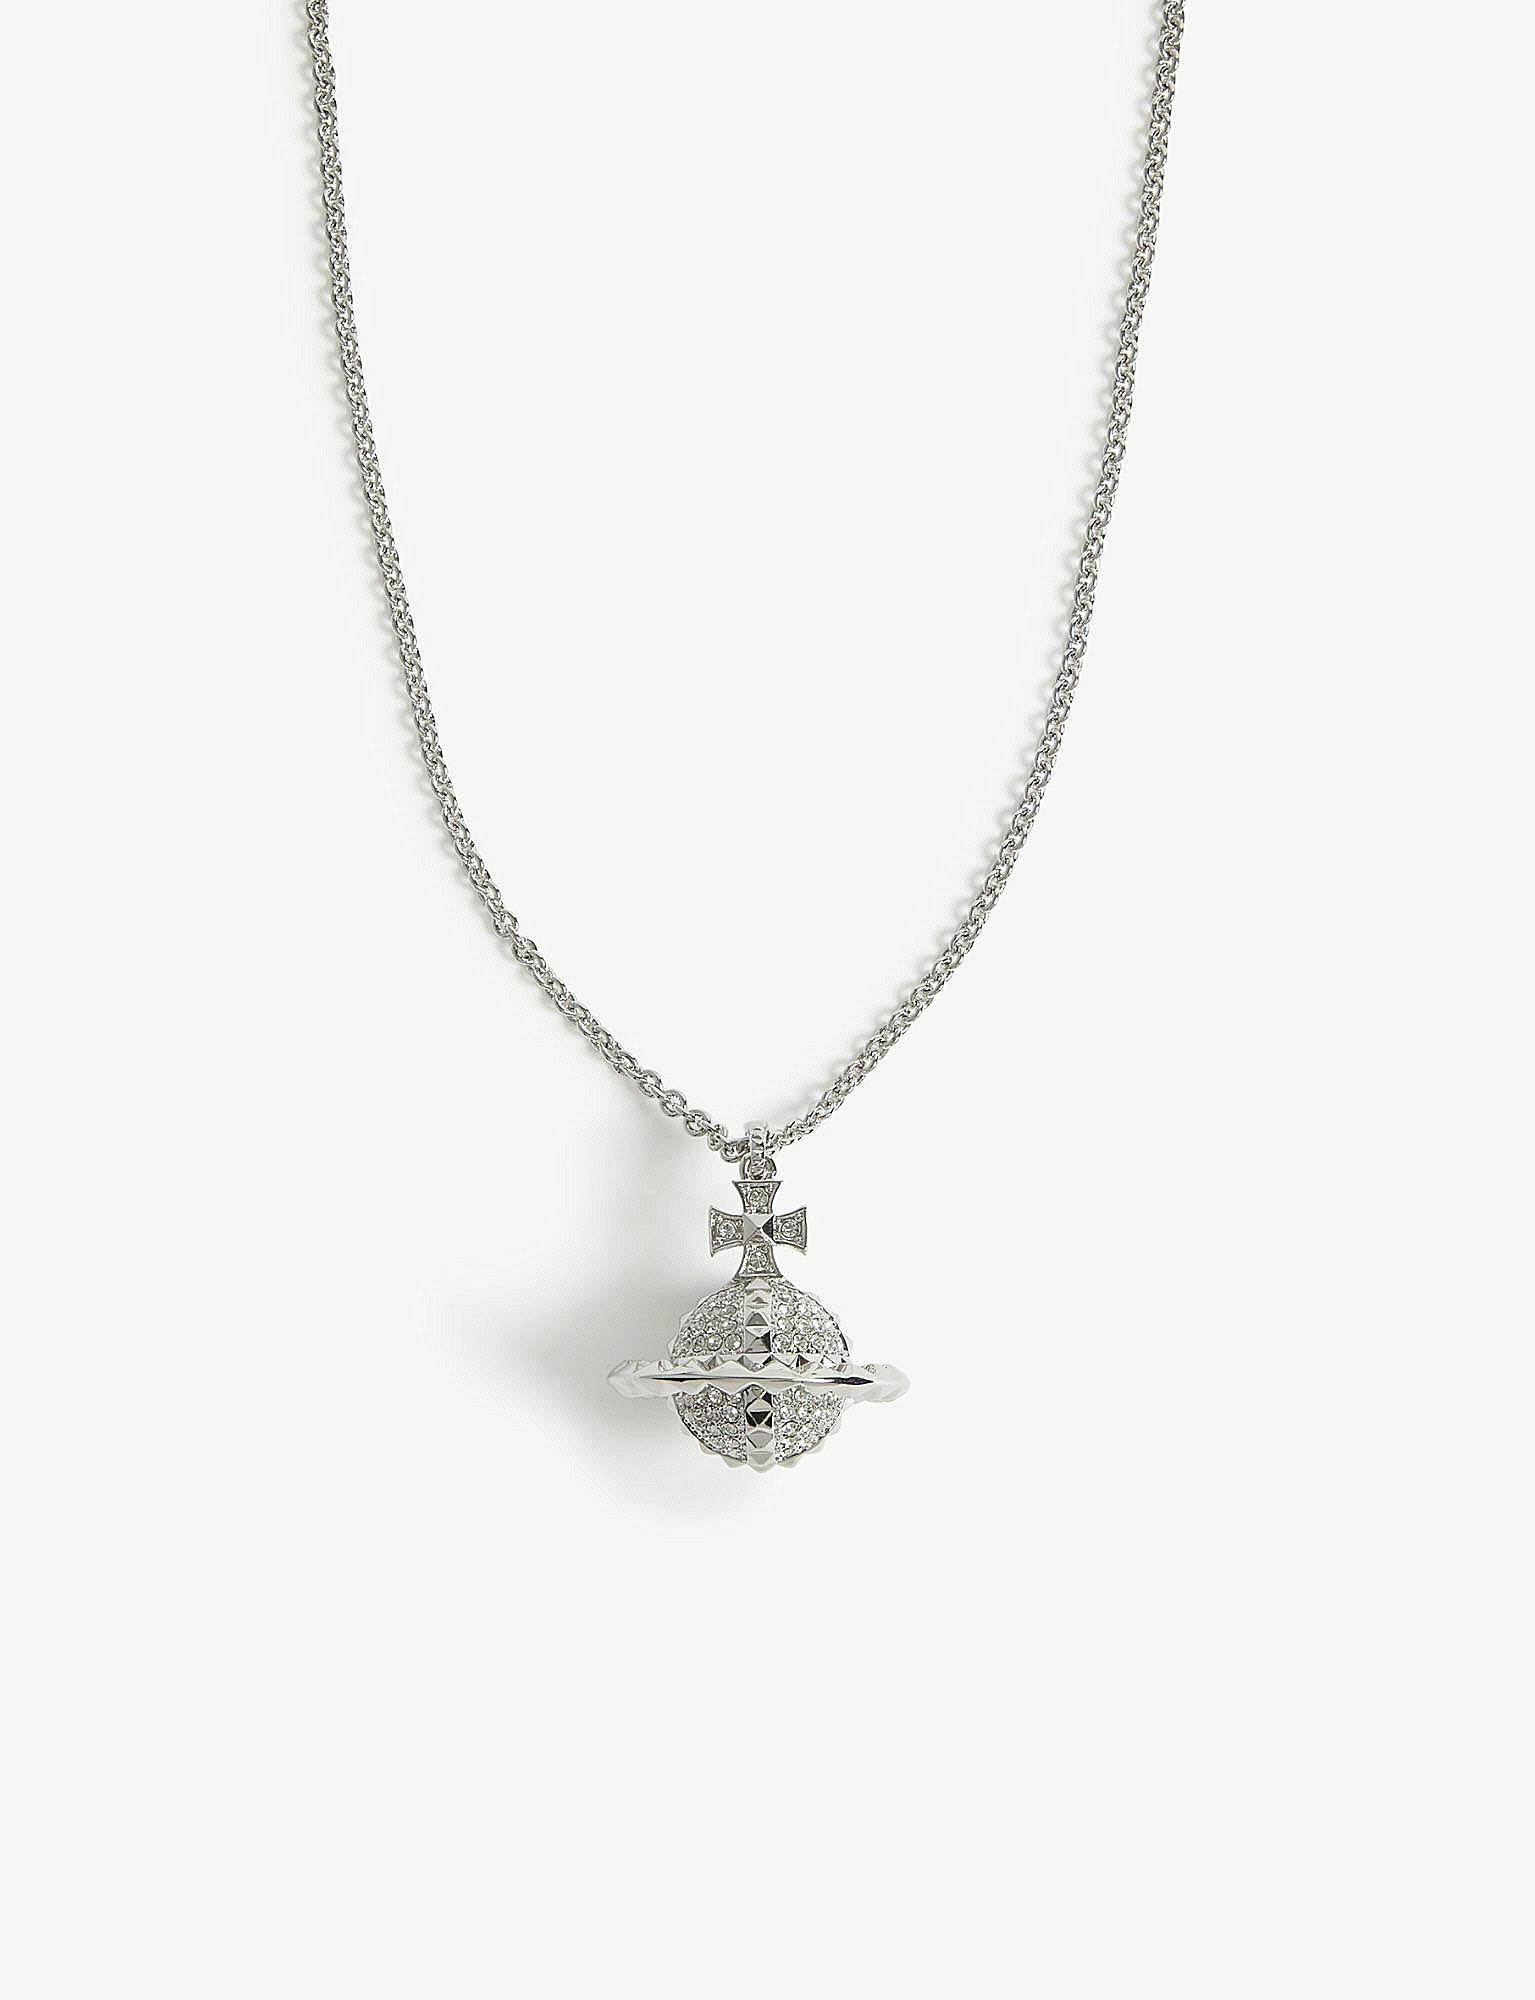 5b0174cbe2c29d Vivienne Westwood Mayfair Orb Pendant Necklace in Metallic - Lyst